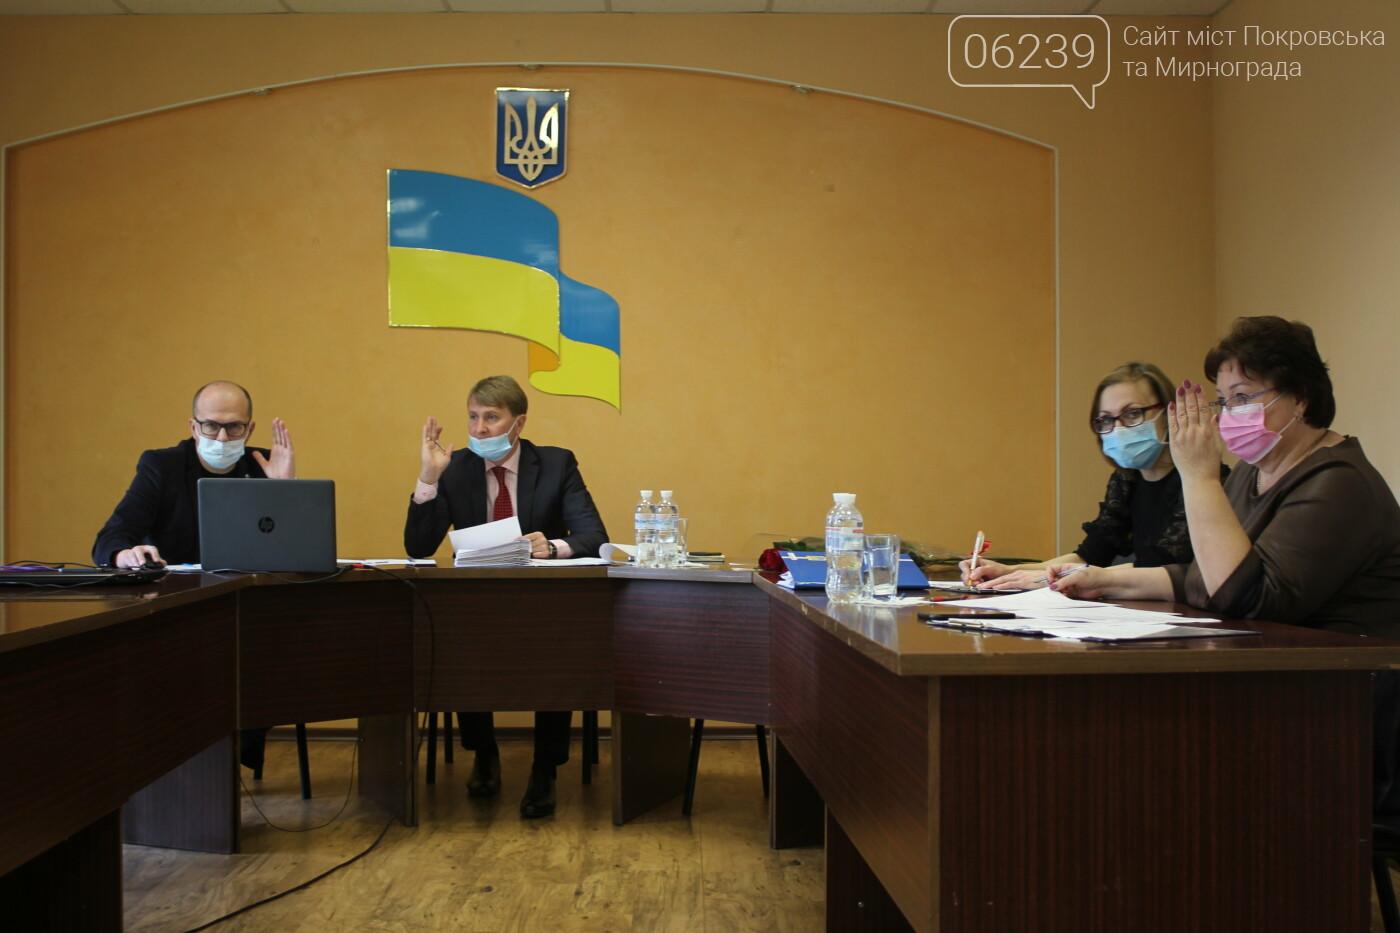 В Мирнограде сессия горсовета снова проходила в онлайн-режиме (вопросы повестки дня), фото-6